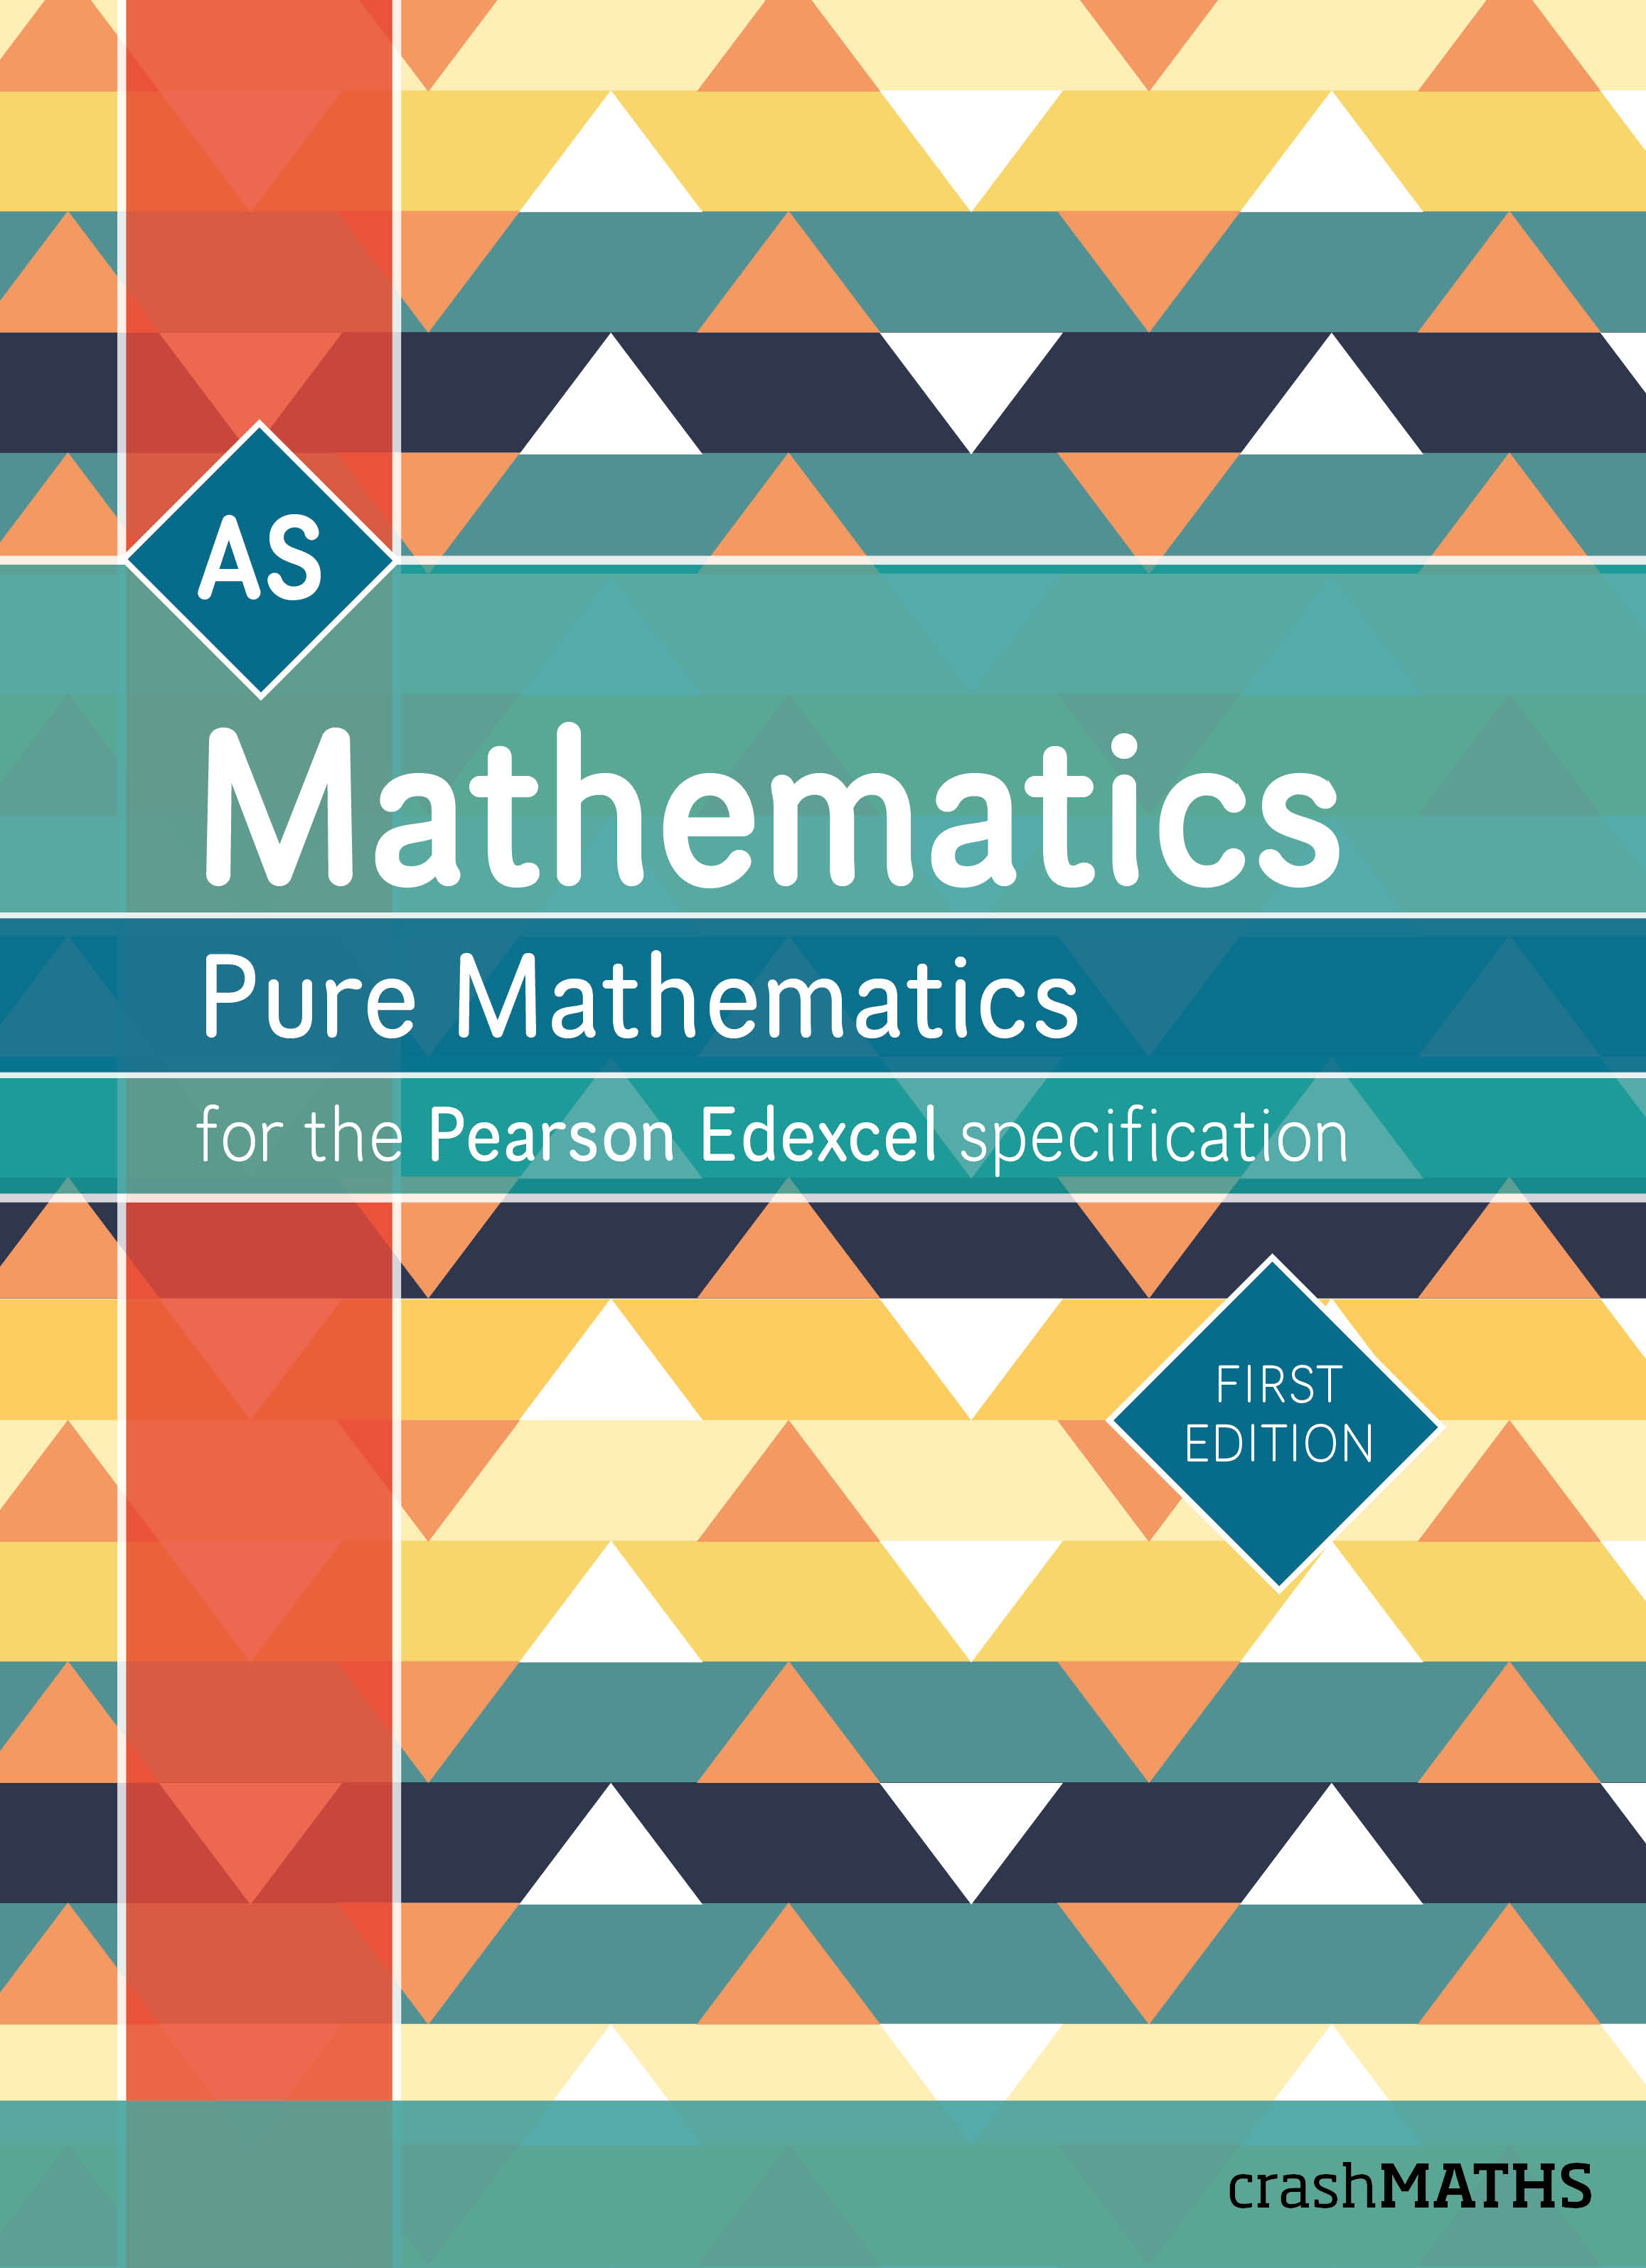 Edexcel AS Level Mathematics - Applied Mathematics Year 1/AS ...